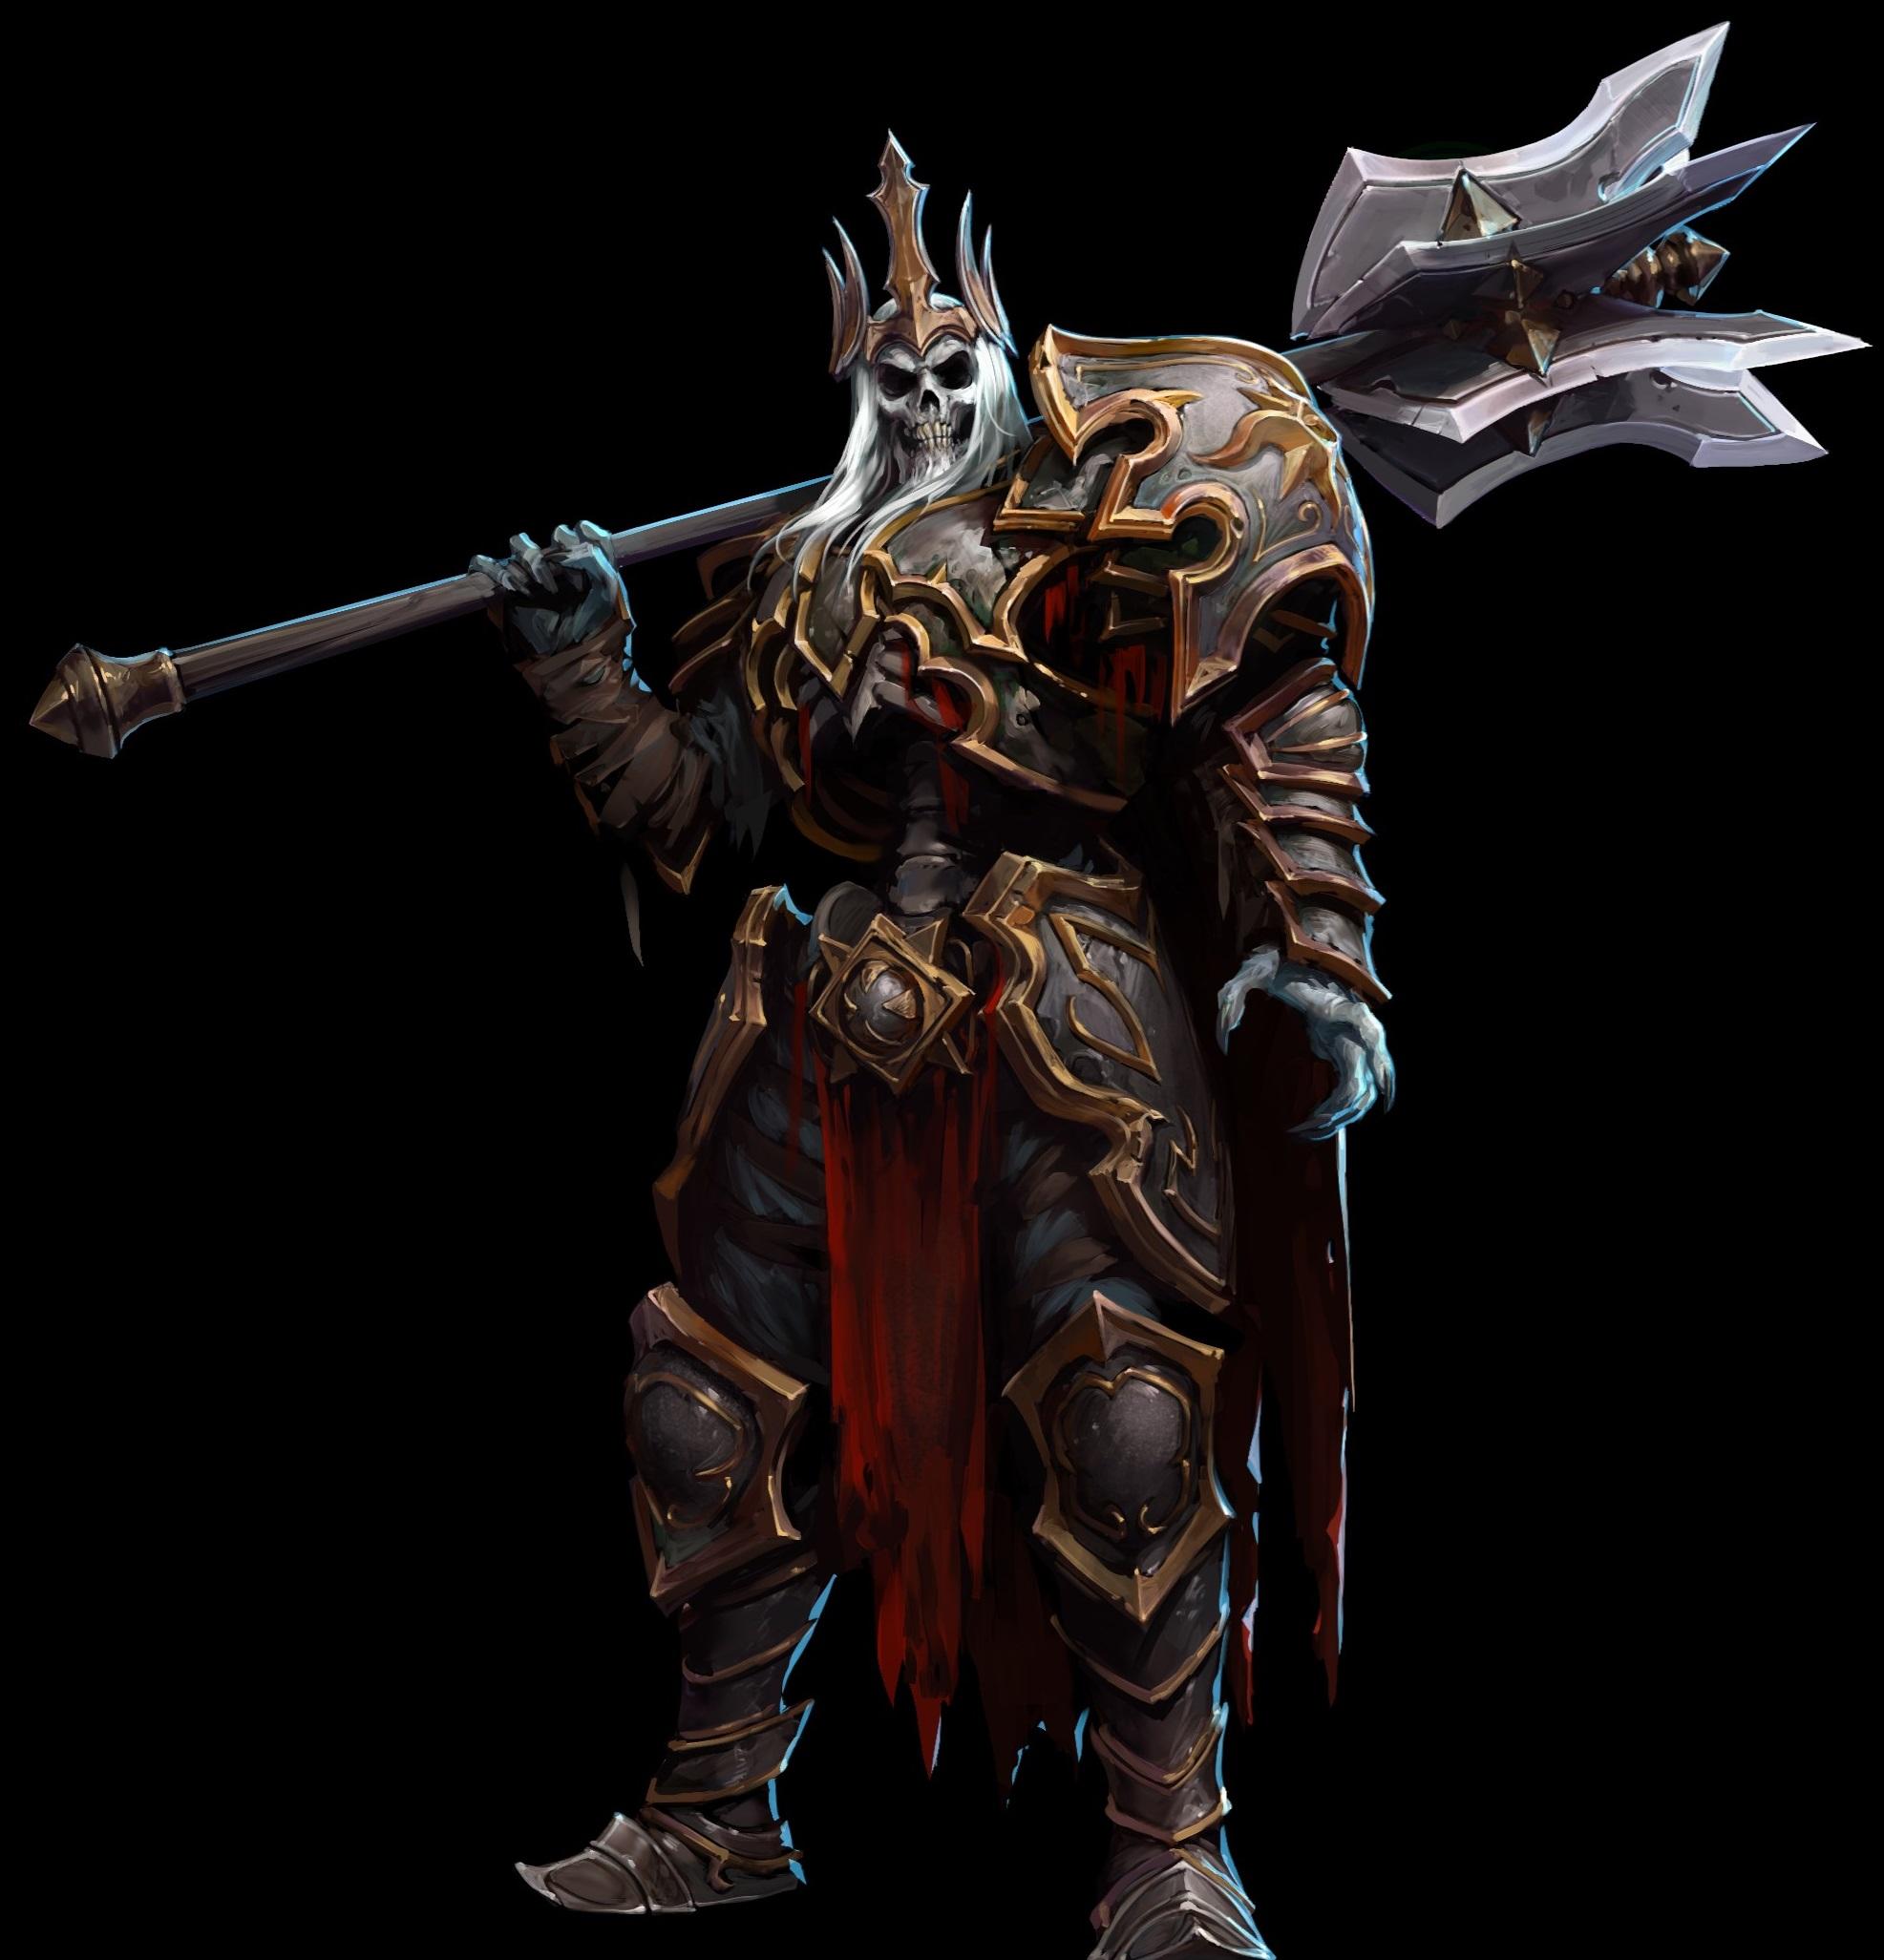 diablo 3 king leoric - photo #21